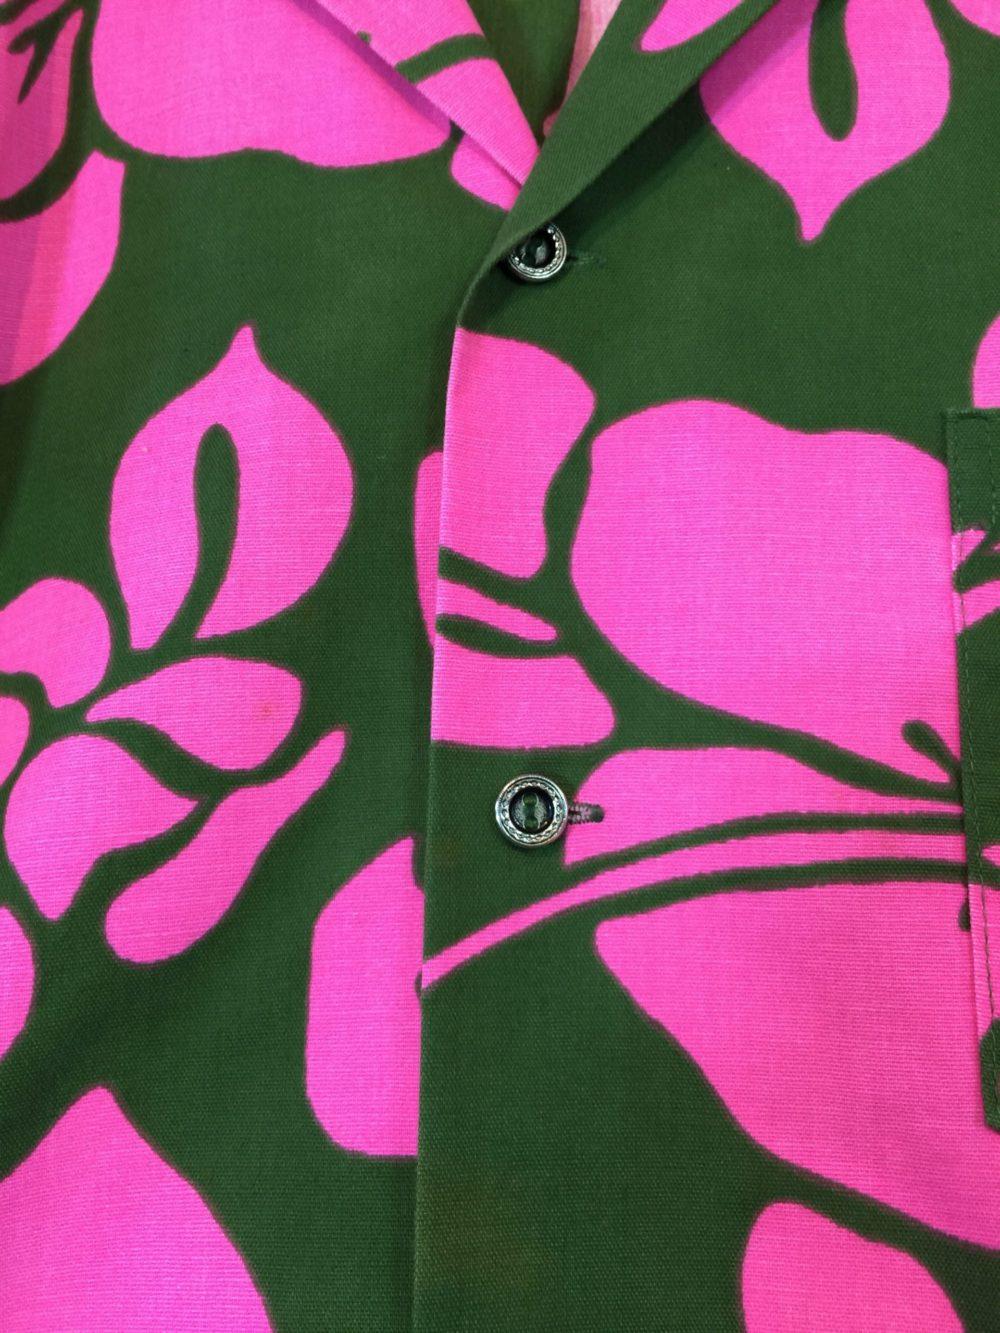 1960's ビンテージアロハシャツ Pomare Tahiti Aloha Shirts